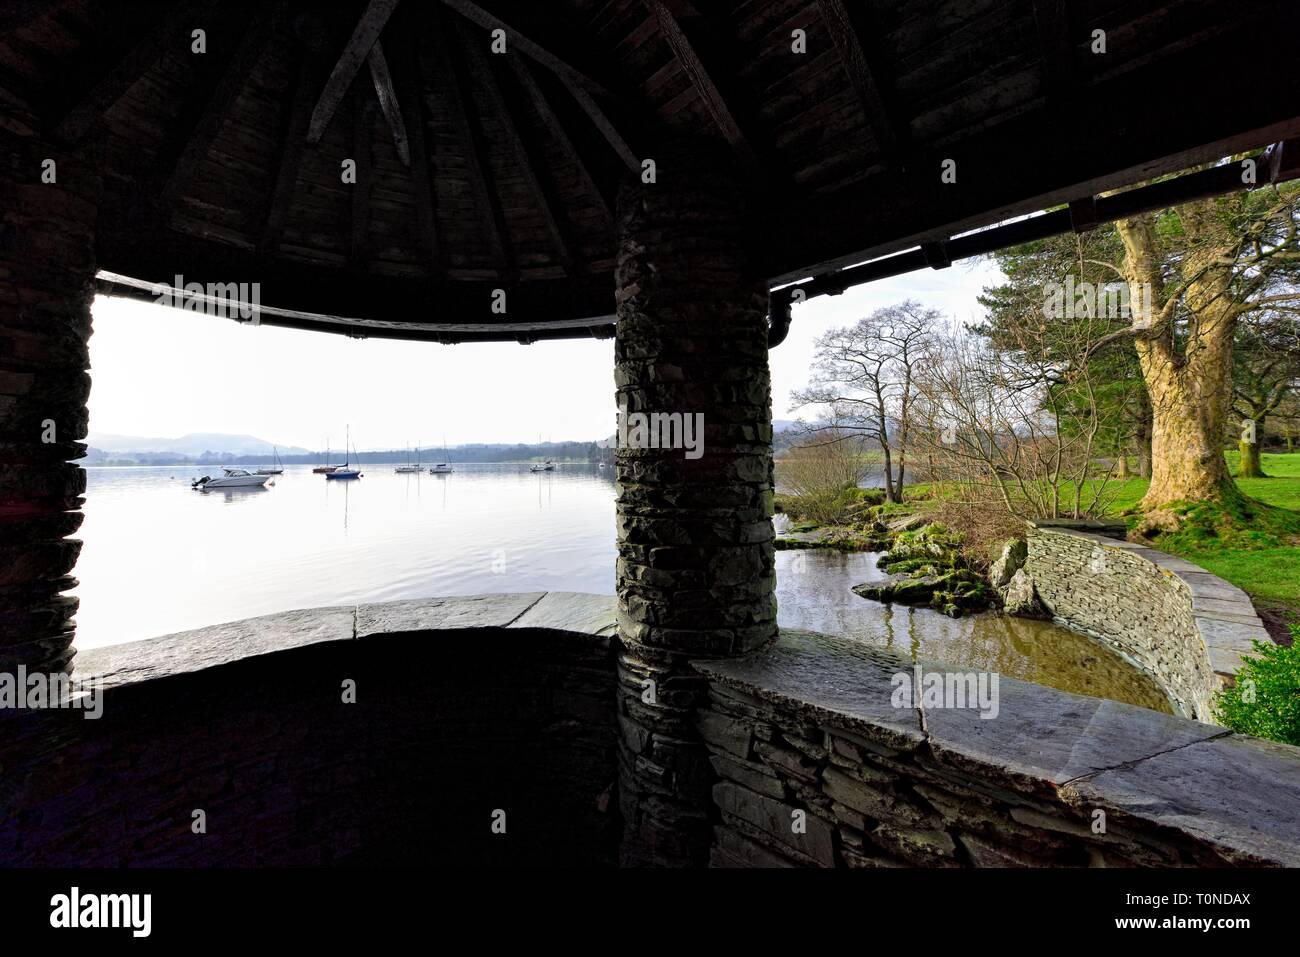 Tourist viewpoint,Lake Windermere,Ambleside,Lake District,Cumbria,England,UK Stock Photo